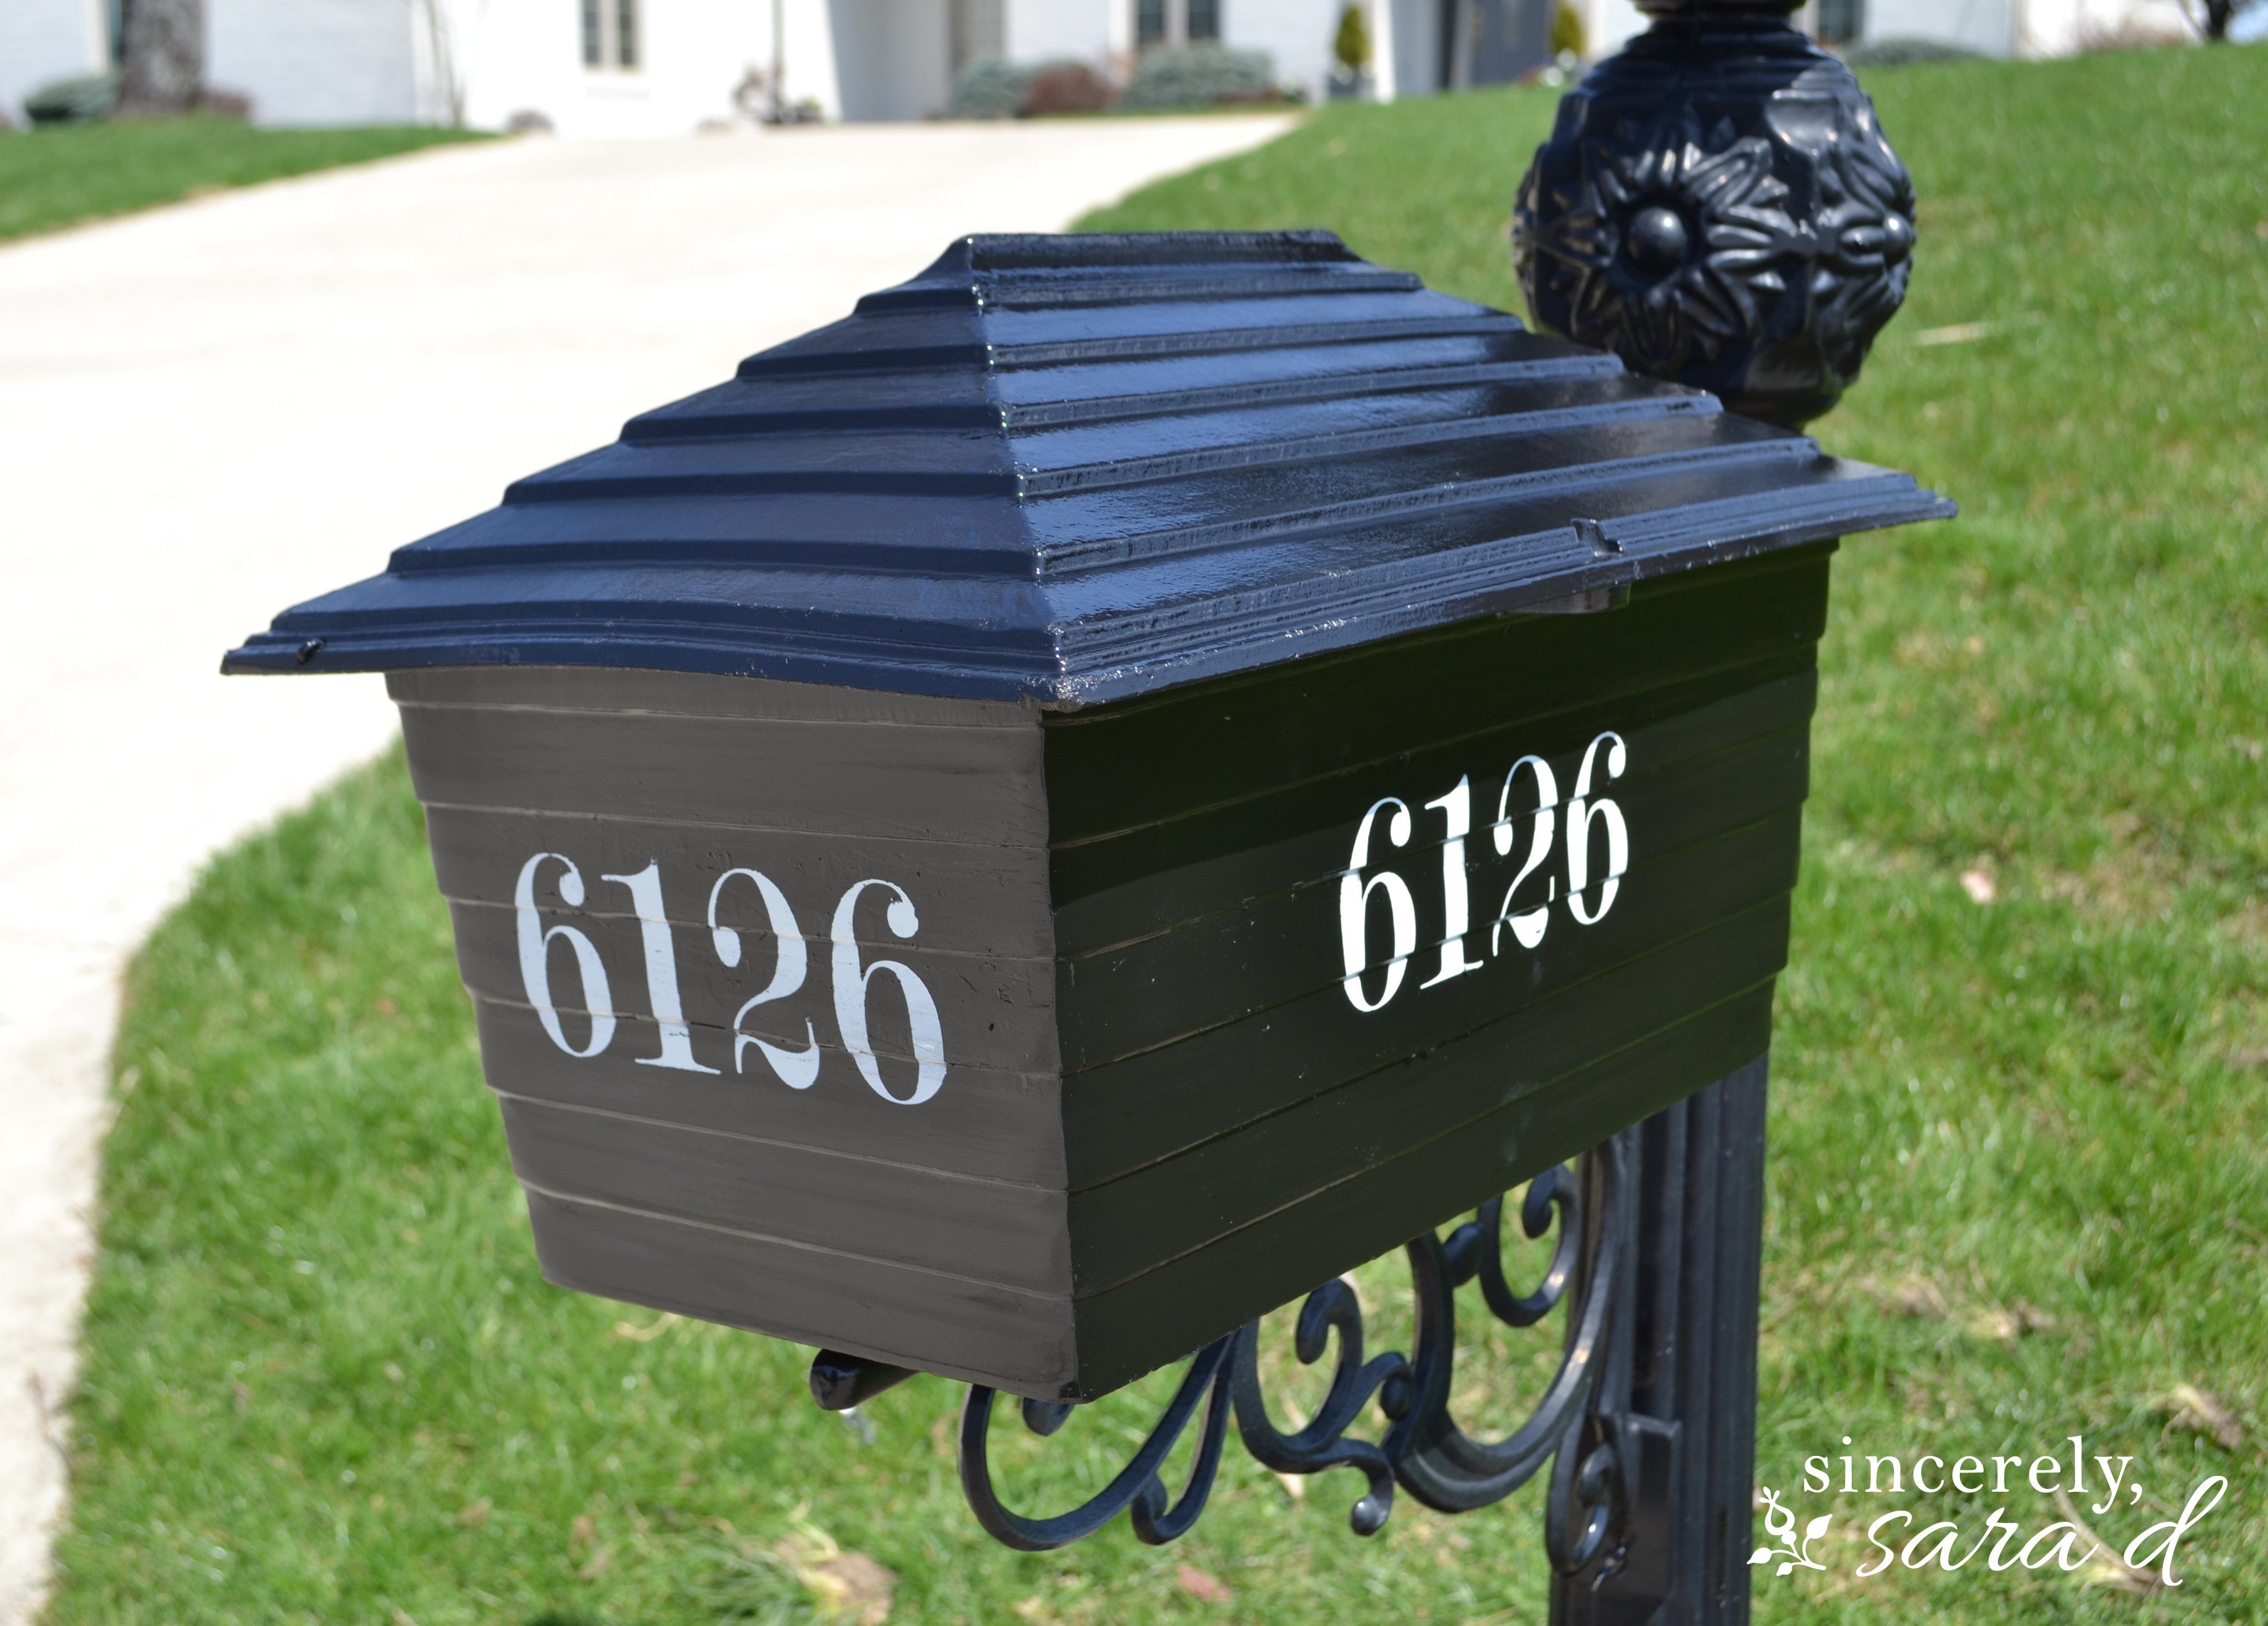 Mailbox Update